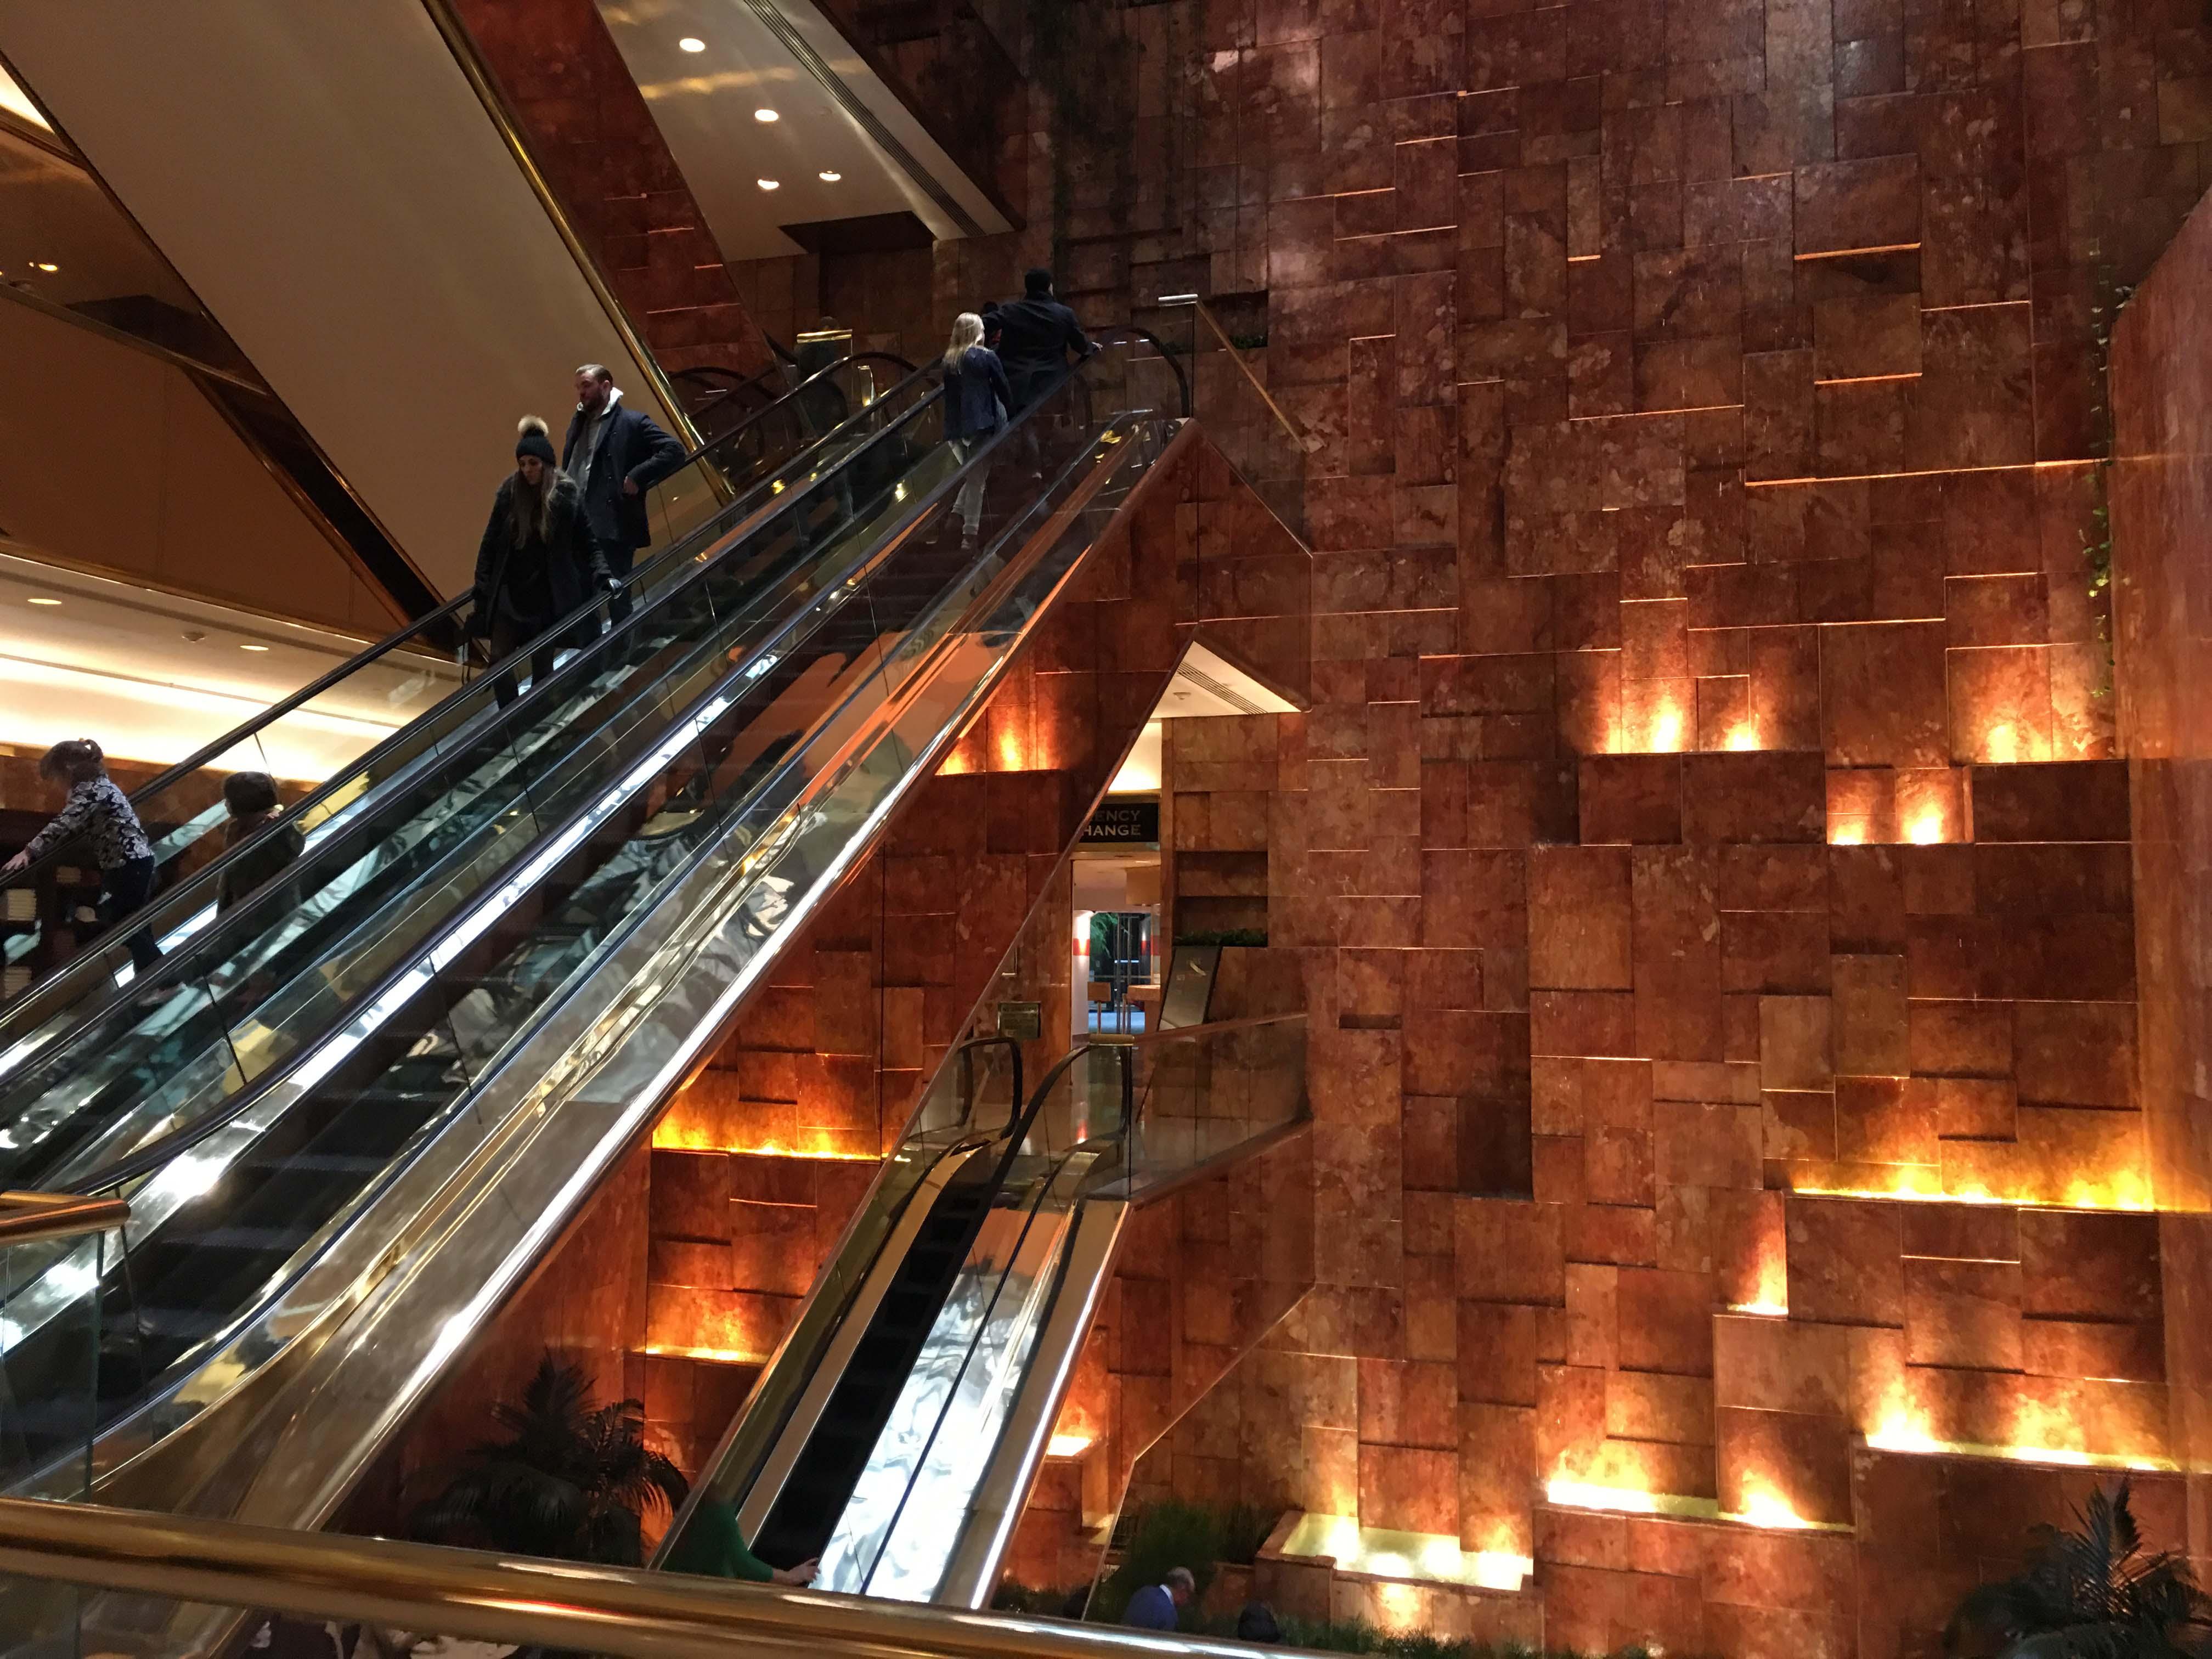 Trump escalator